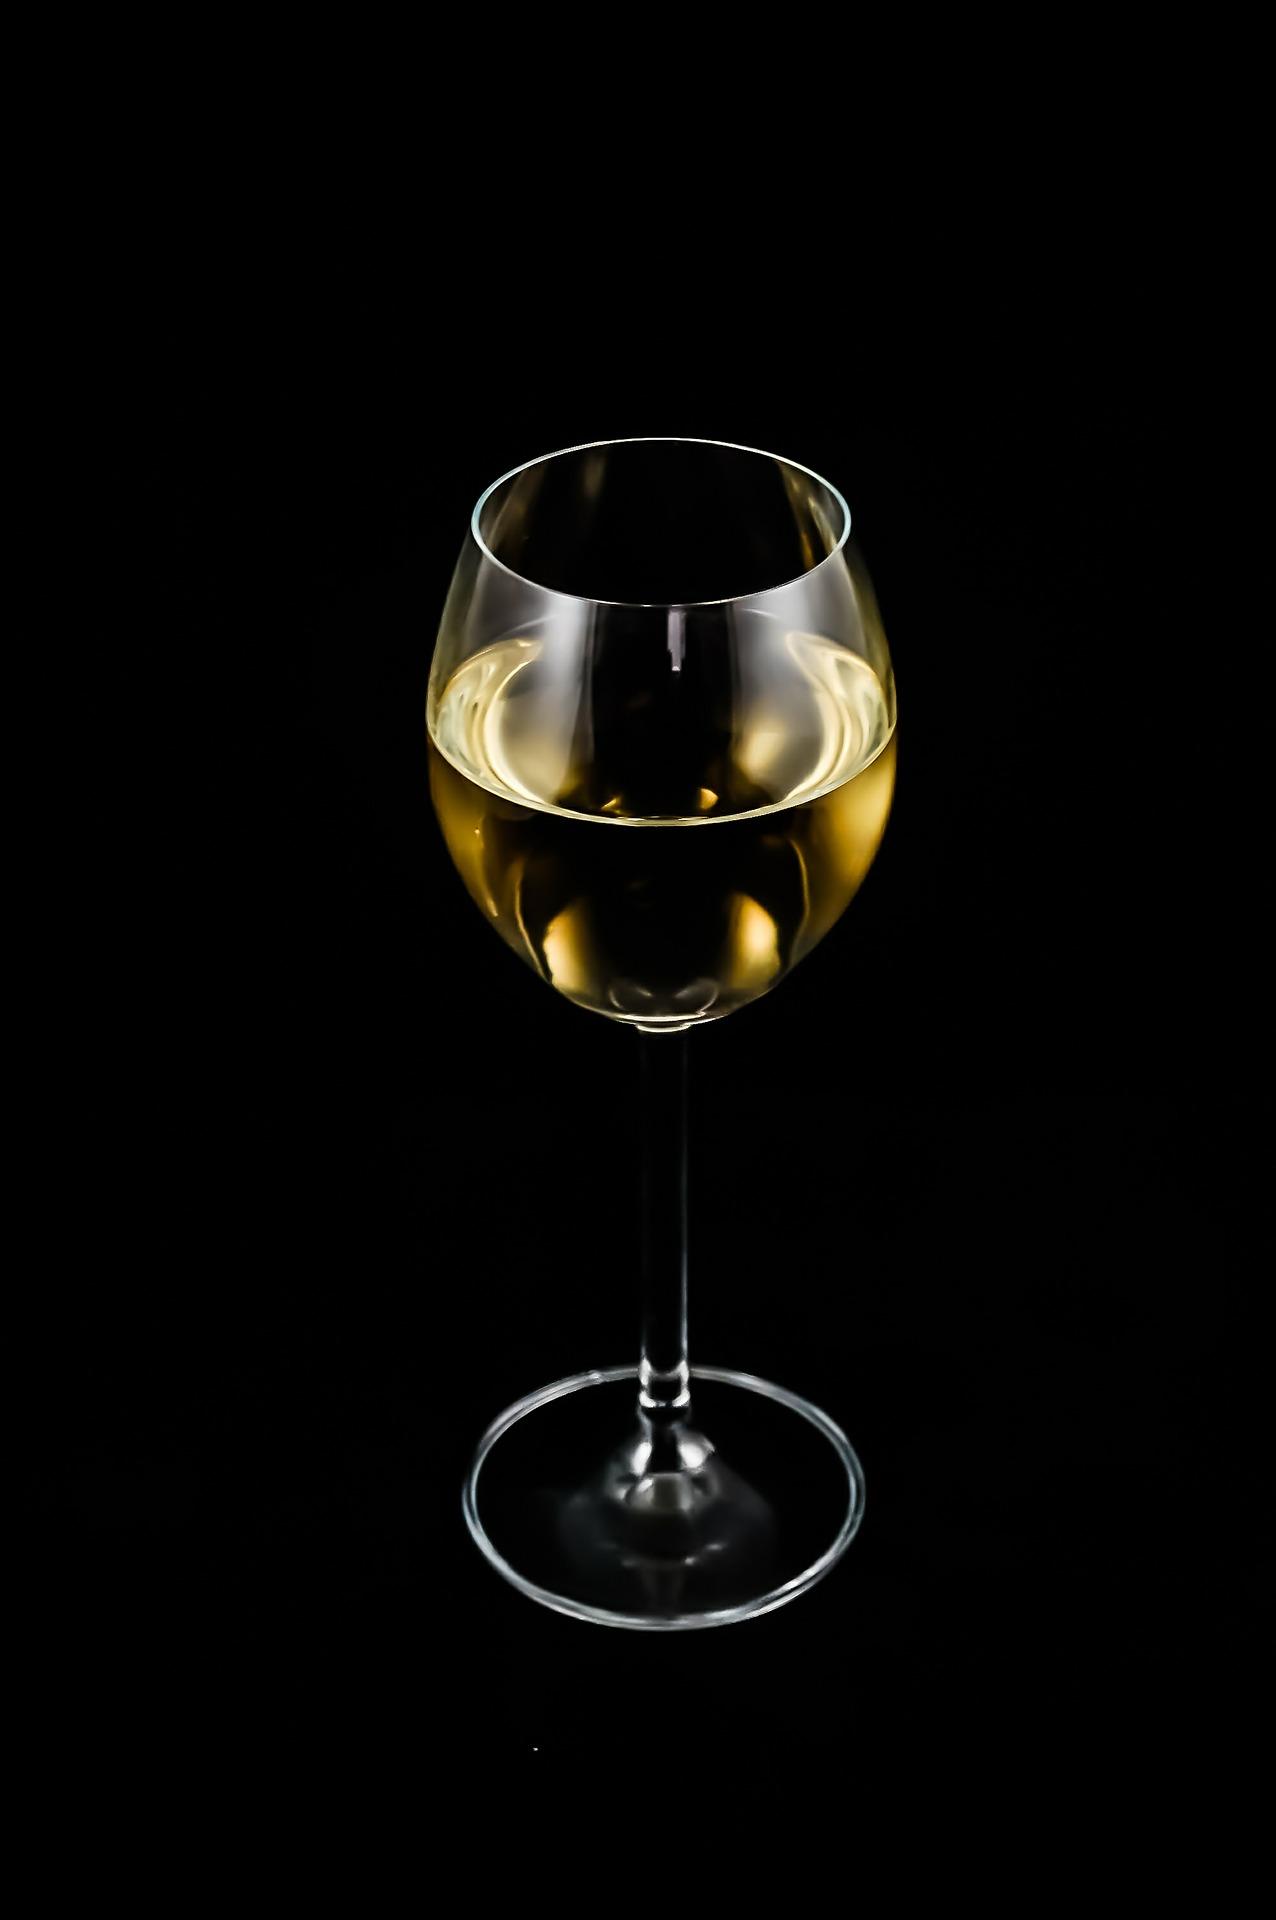 Copa de vino blanco 6333 notefolio for Copa vino blanco